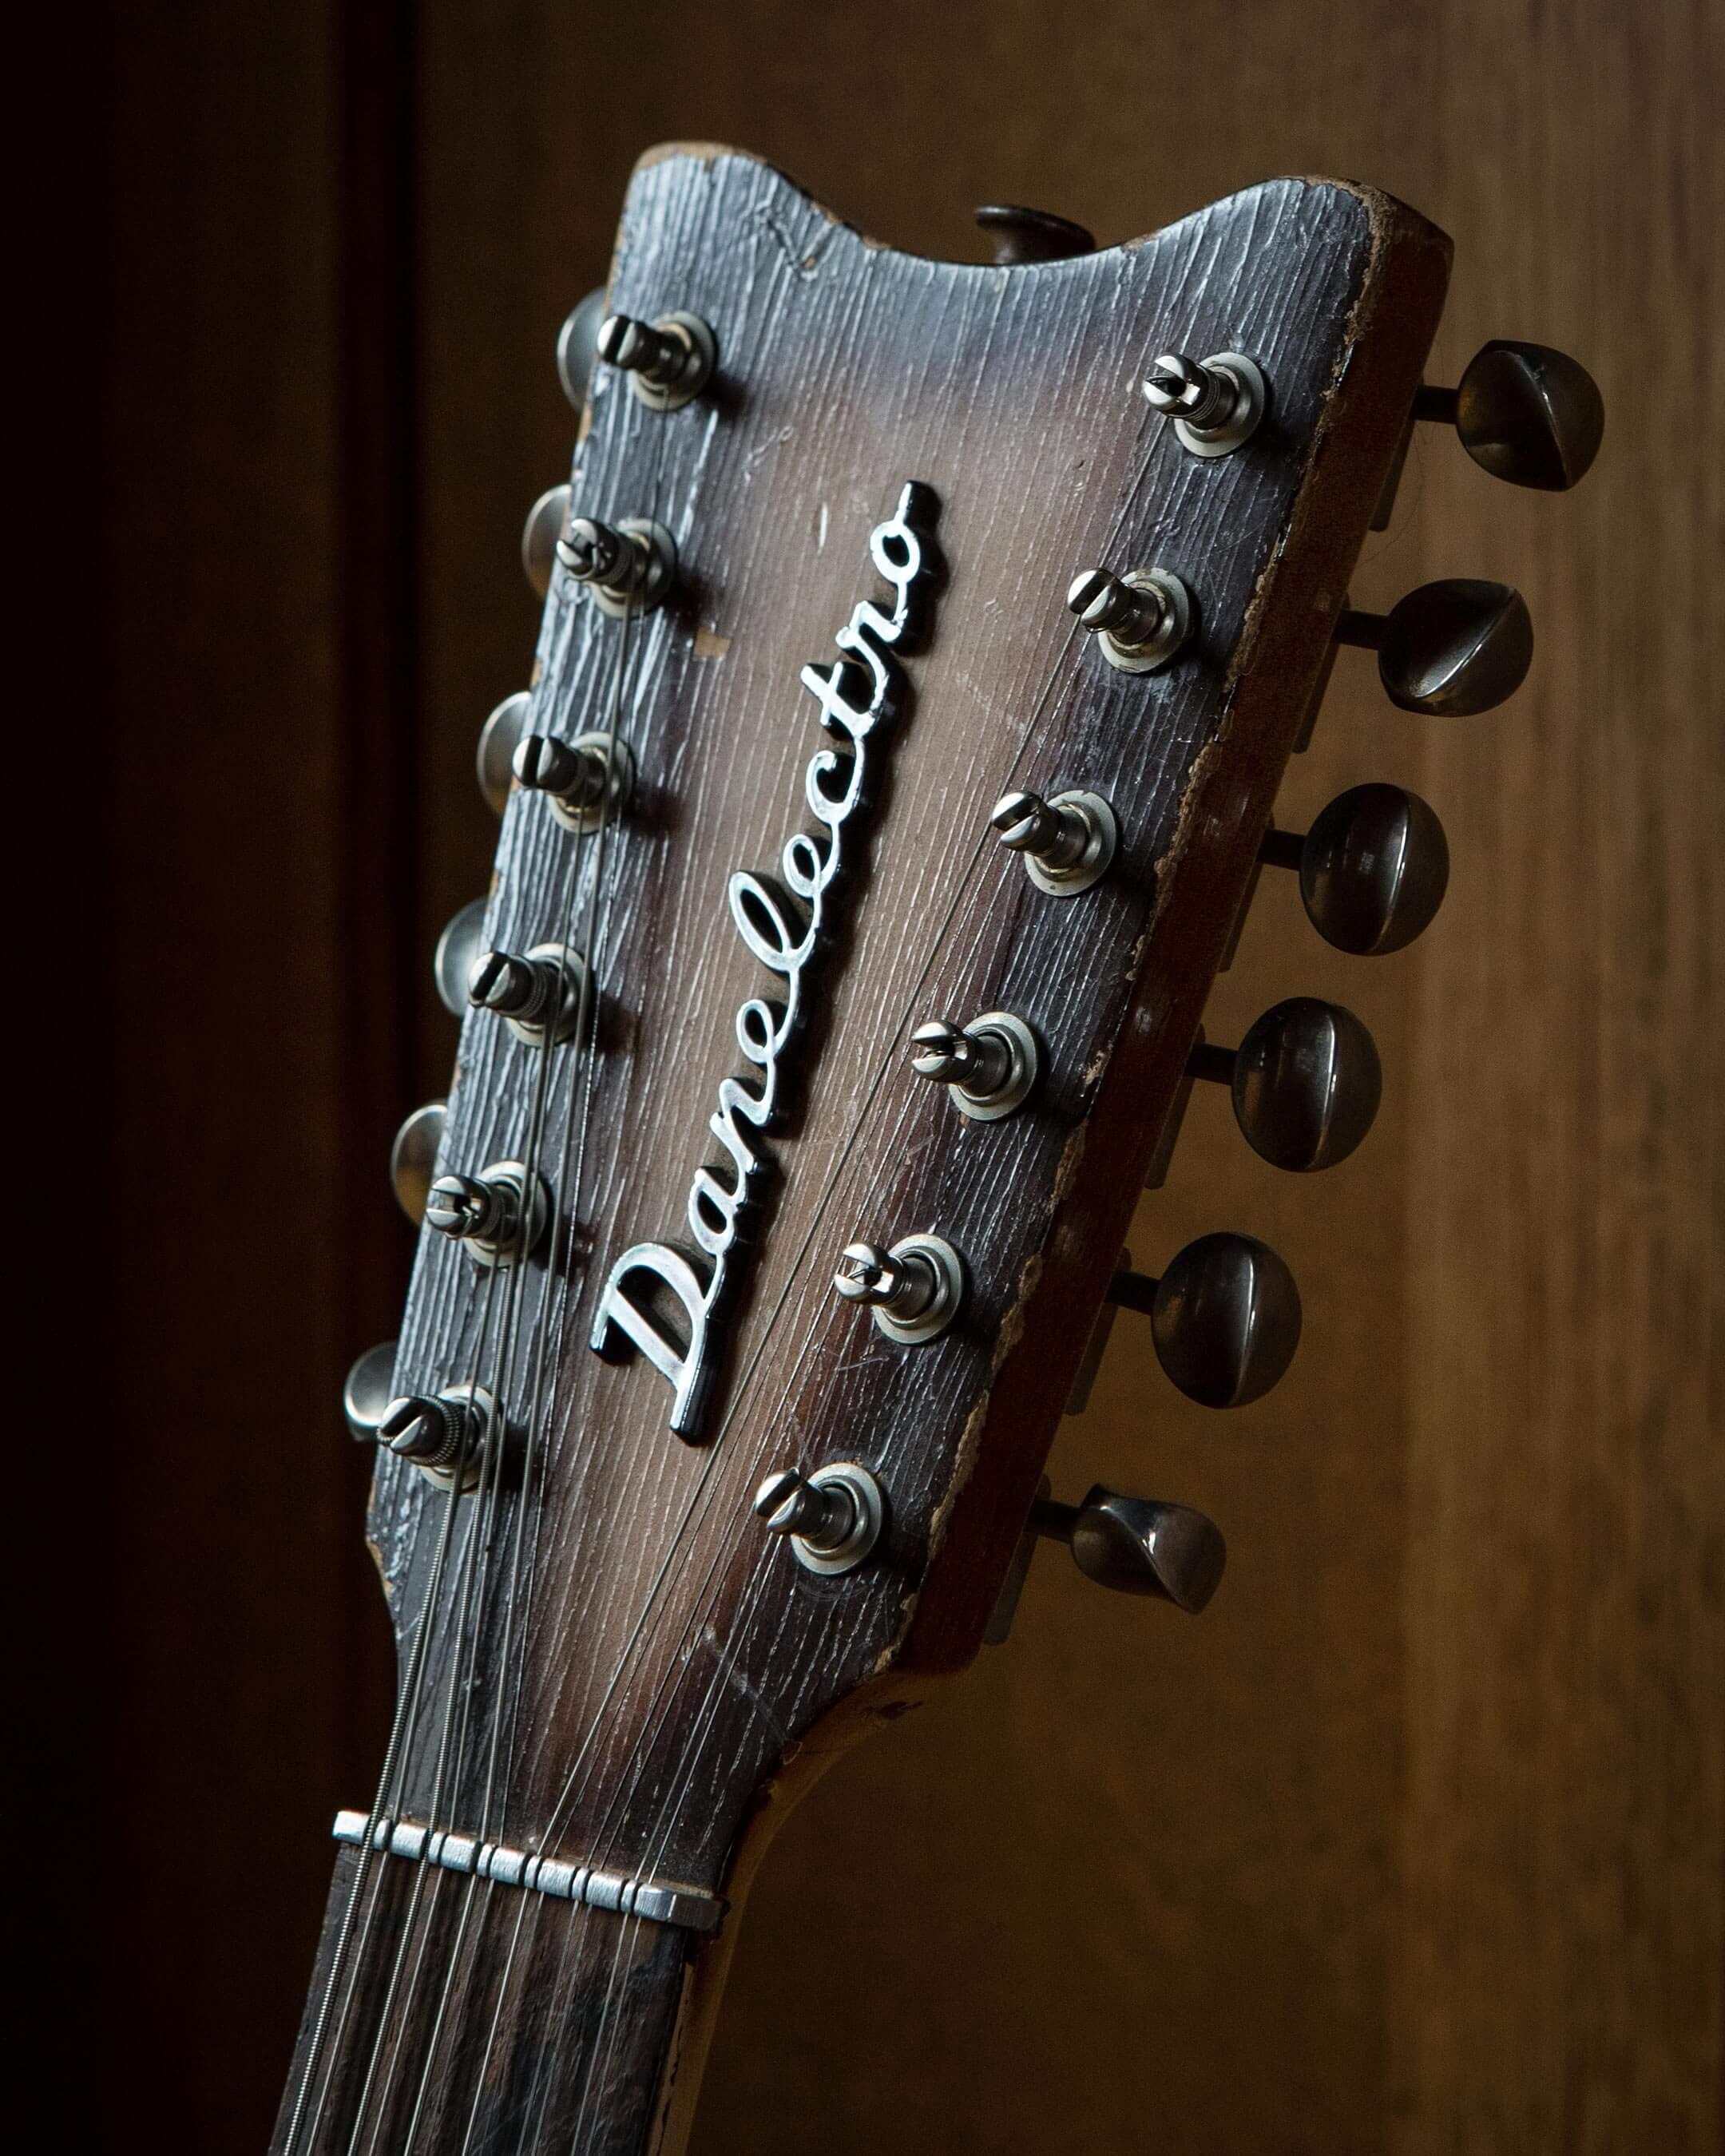 Teenage Fanclub's Danelectro 12-string